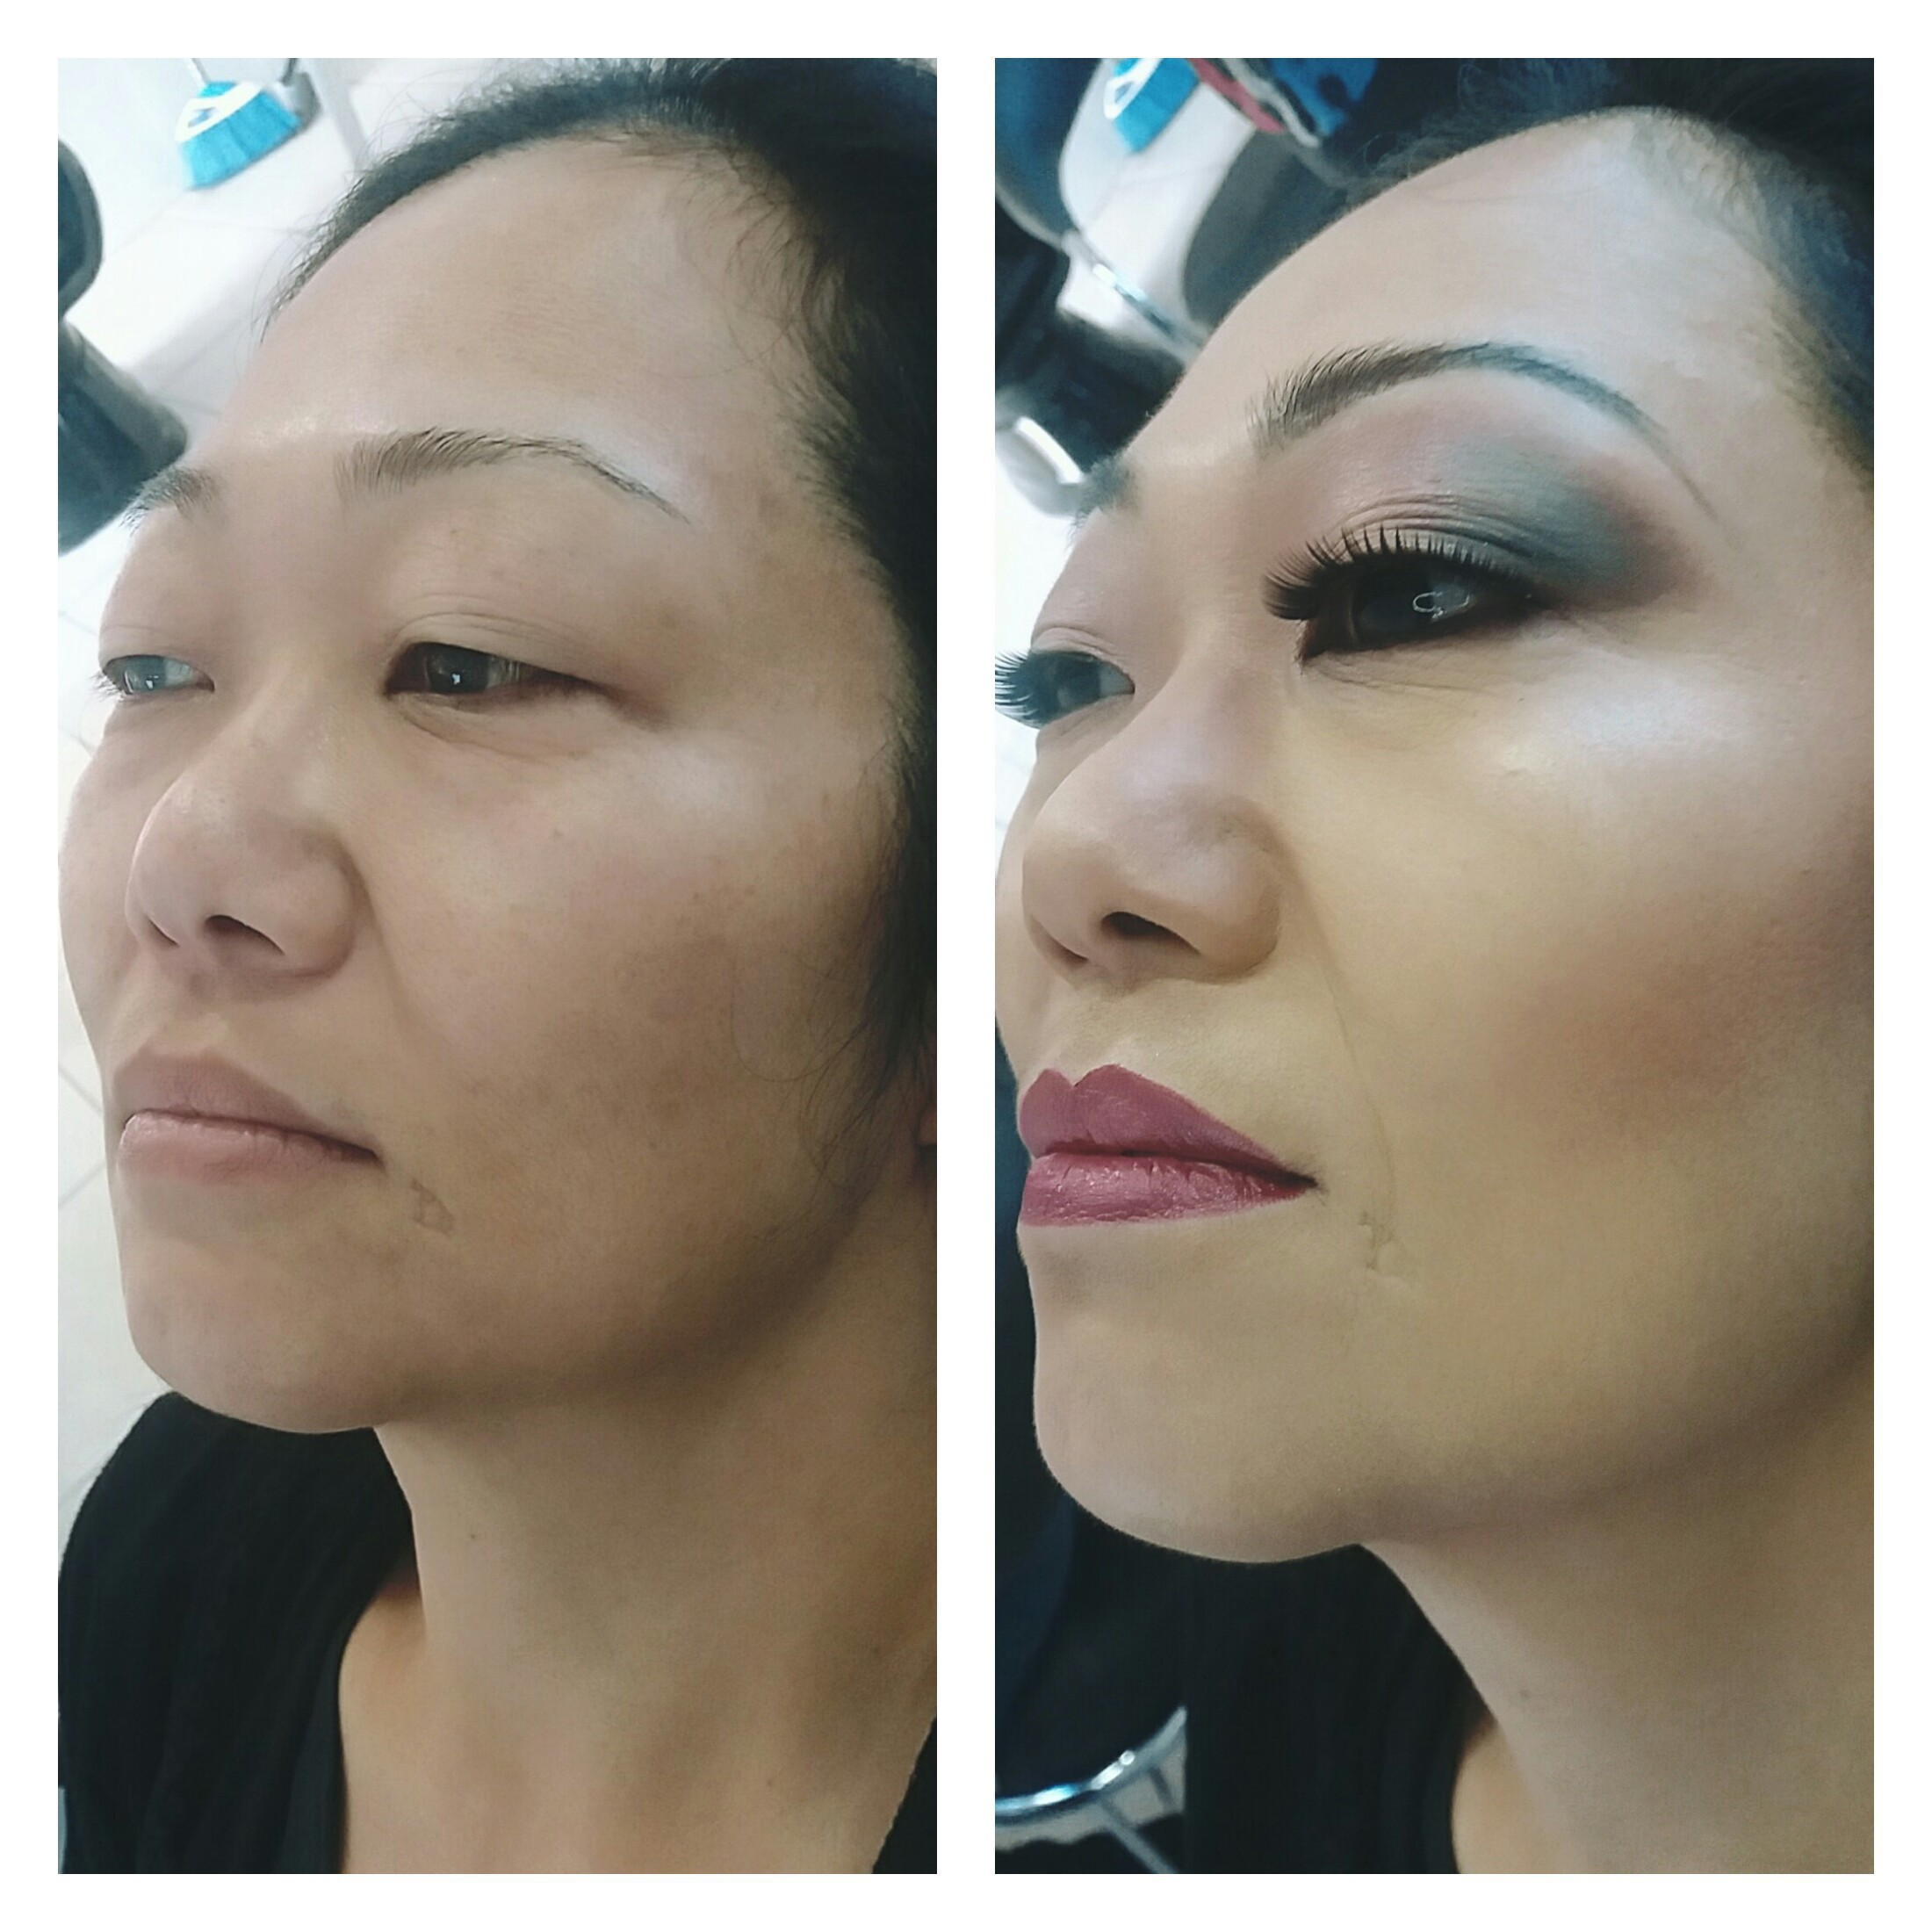 Maquiagem profissional #maquiagemoriental #maquiagemprofissional #lovemakeup  maquiagem